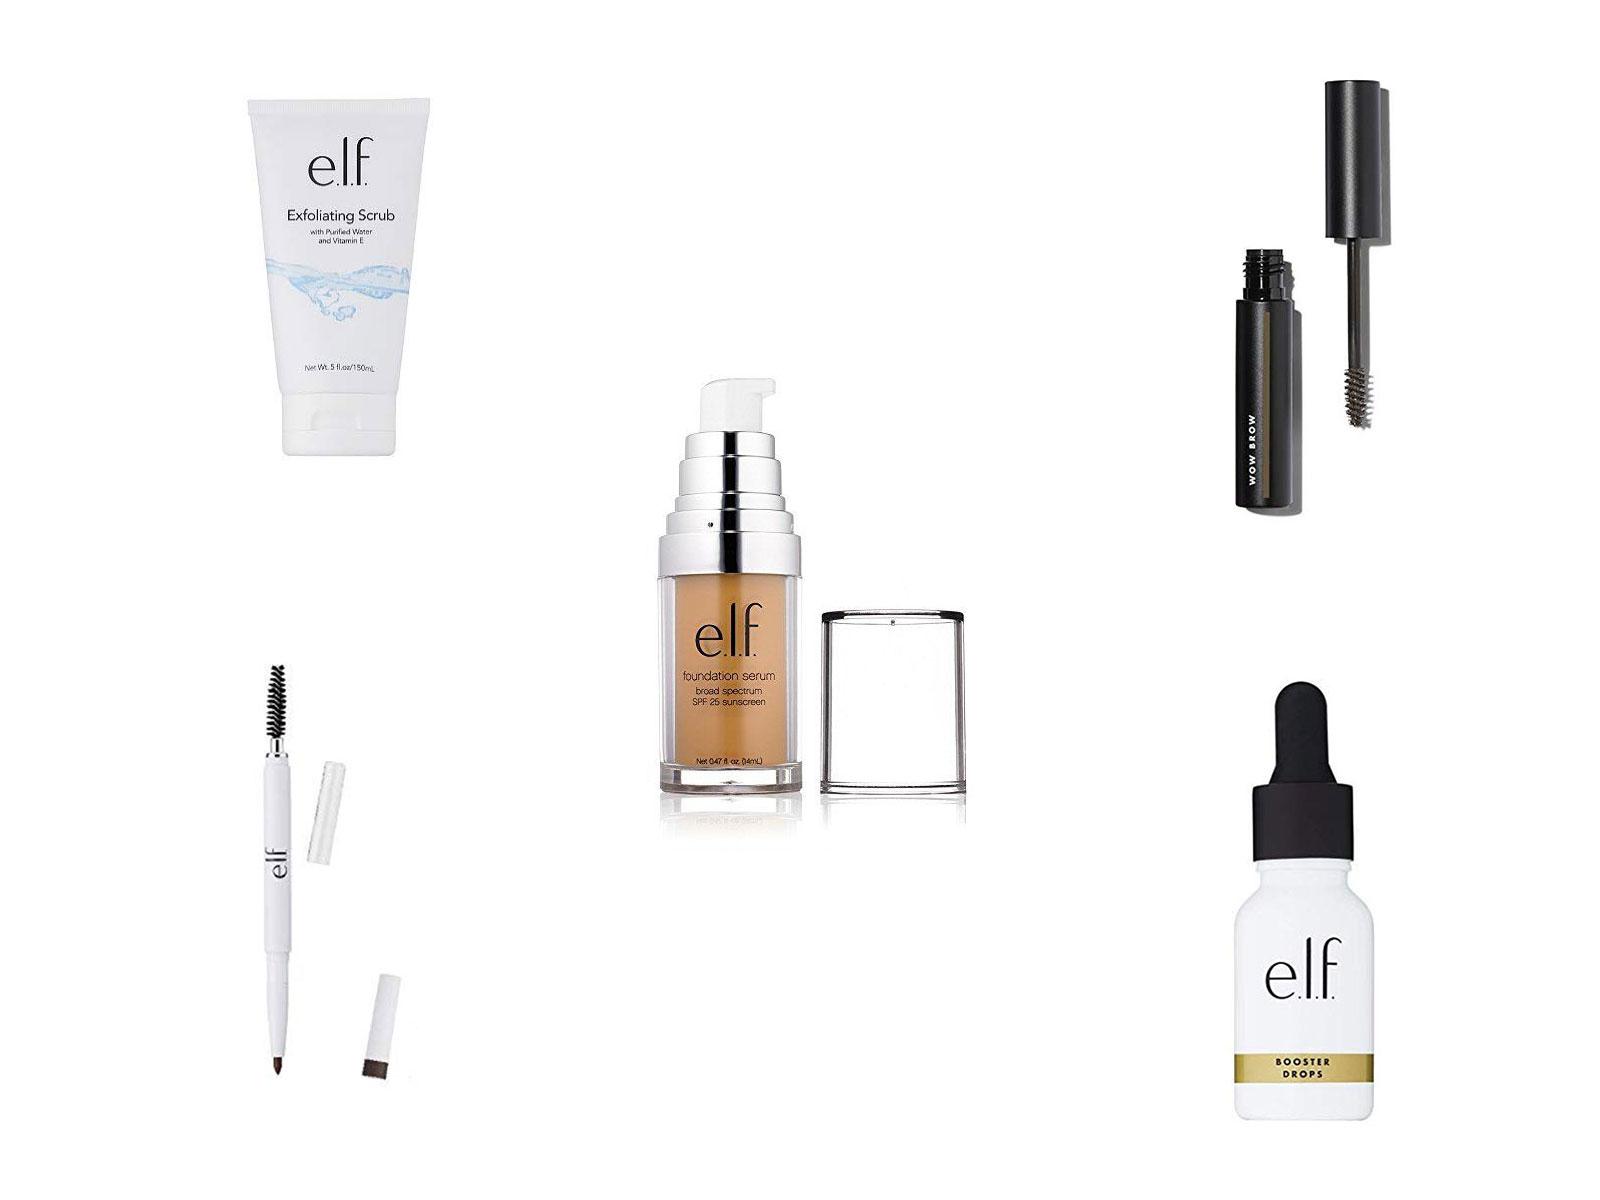 15-Best-e.l.f-Cosmetics-Makeup-Beauty-Products-2019-E.L.F-F